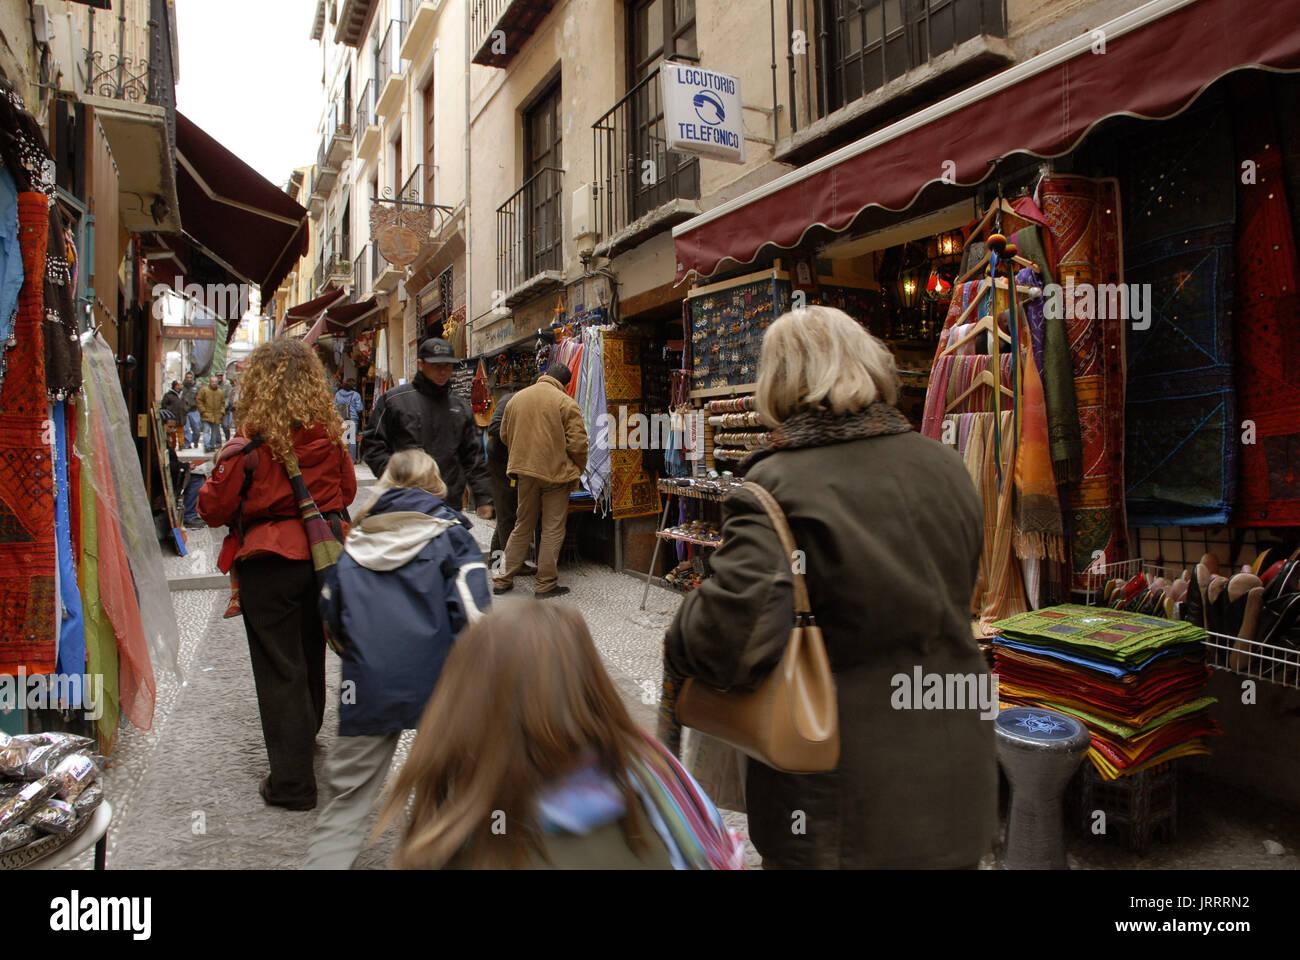 Tourists at the The Albaycin neighborhood, The Moorish quarter in